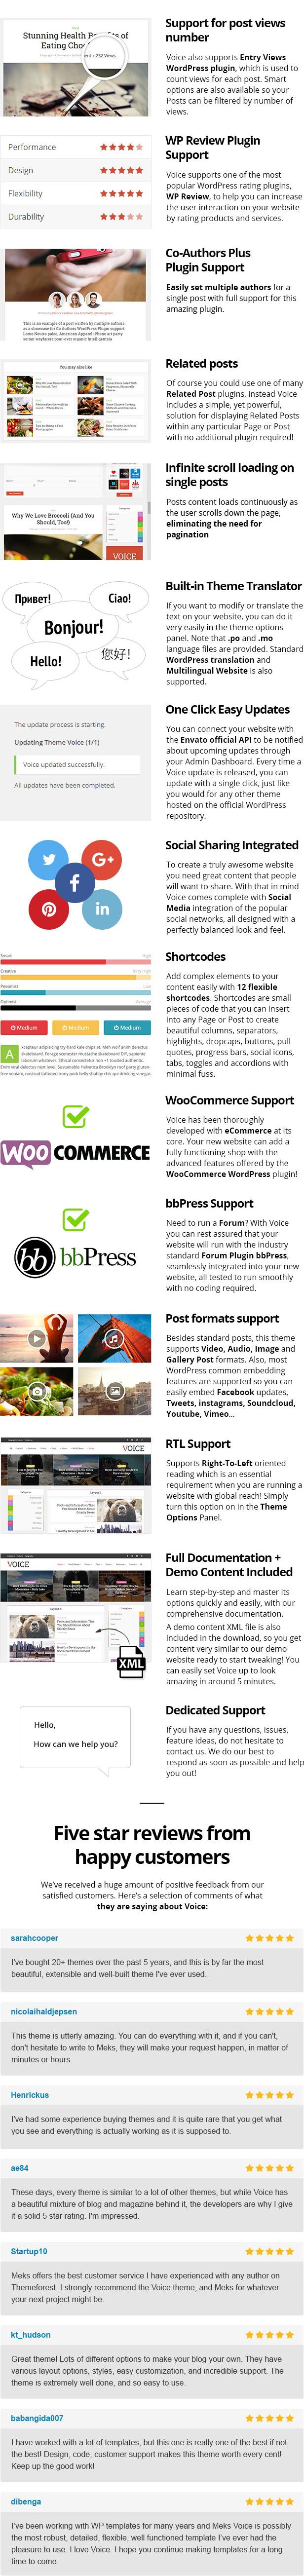 voice features part02 - Voice - News Magazine WordPress Theme